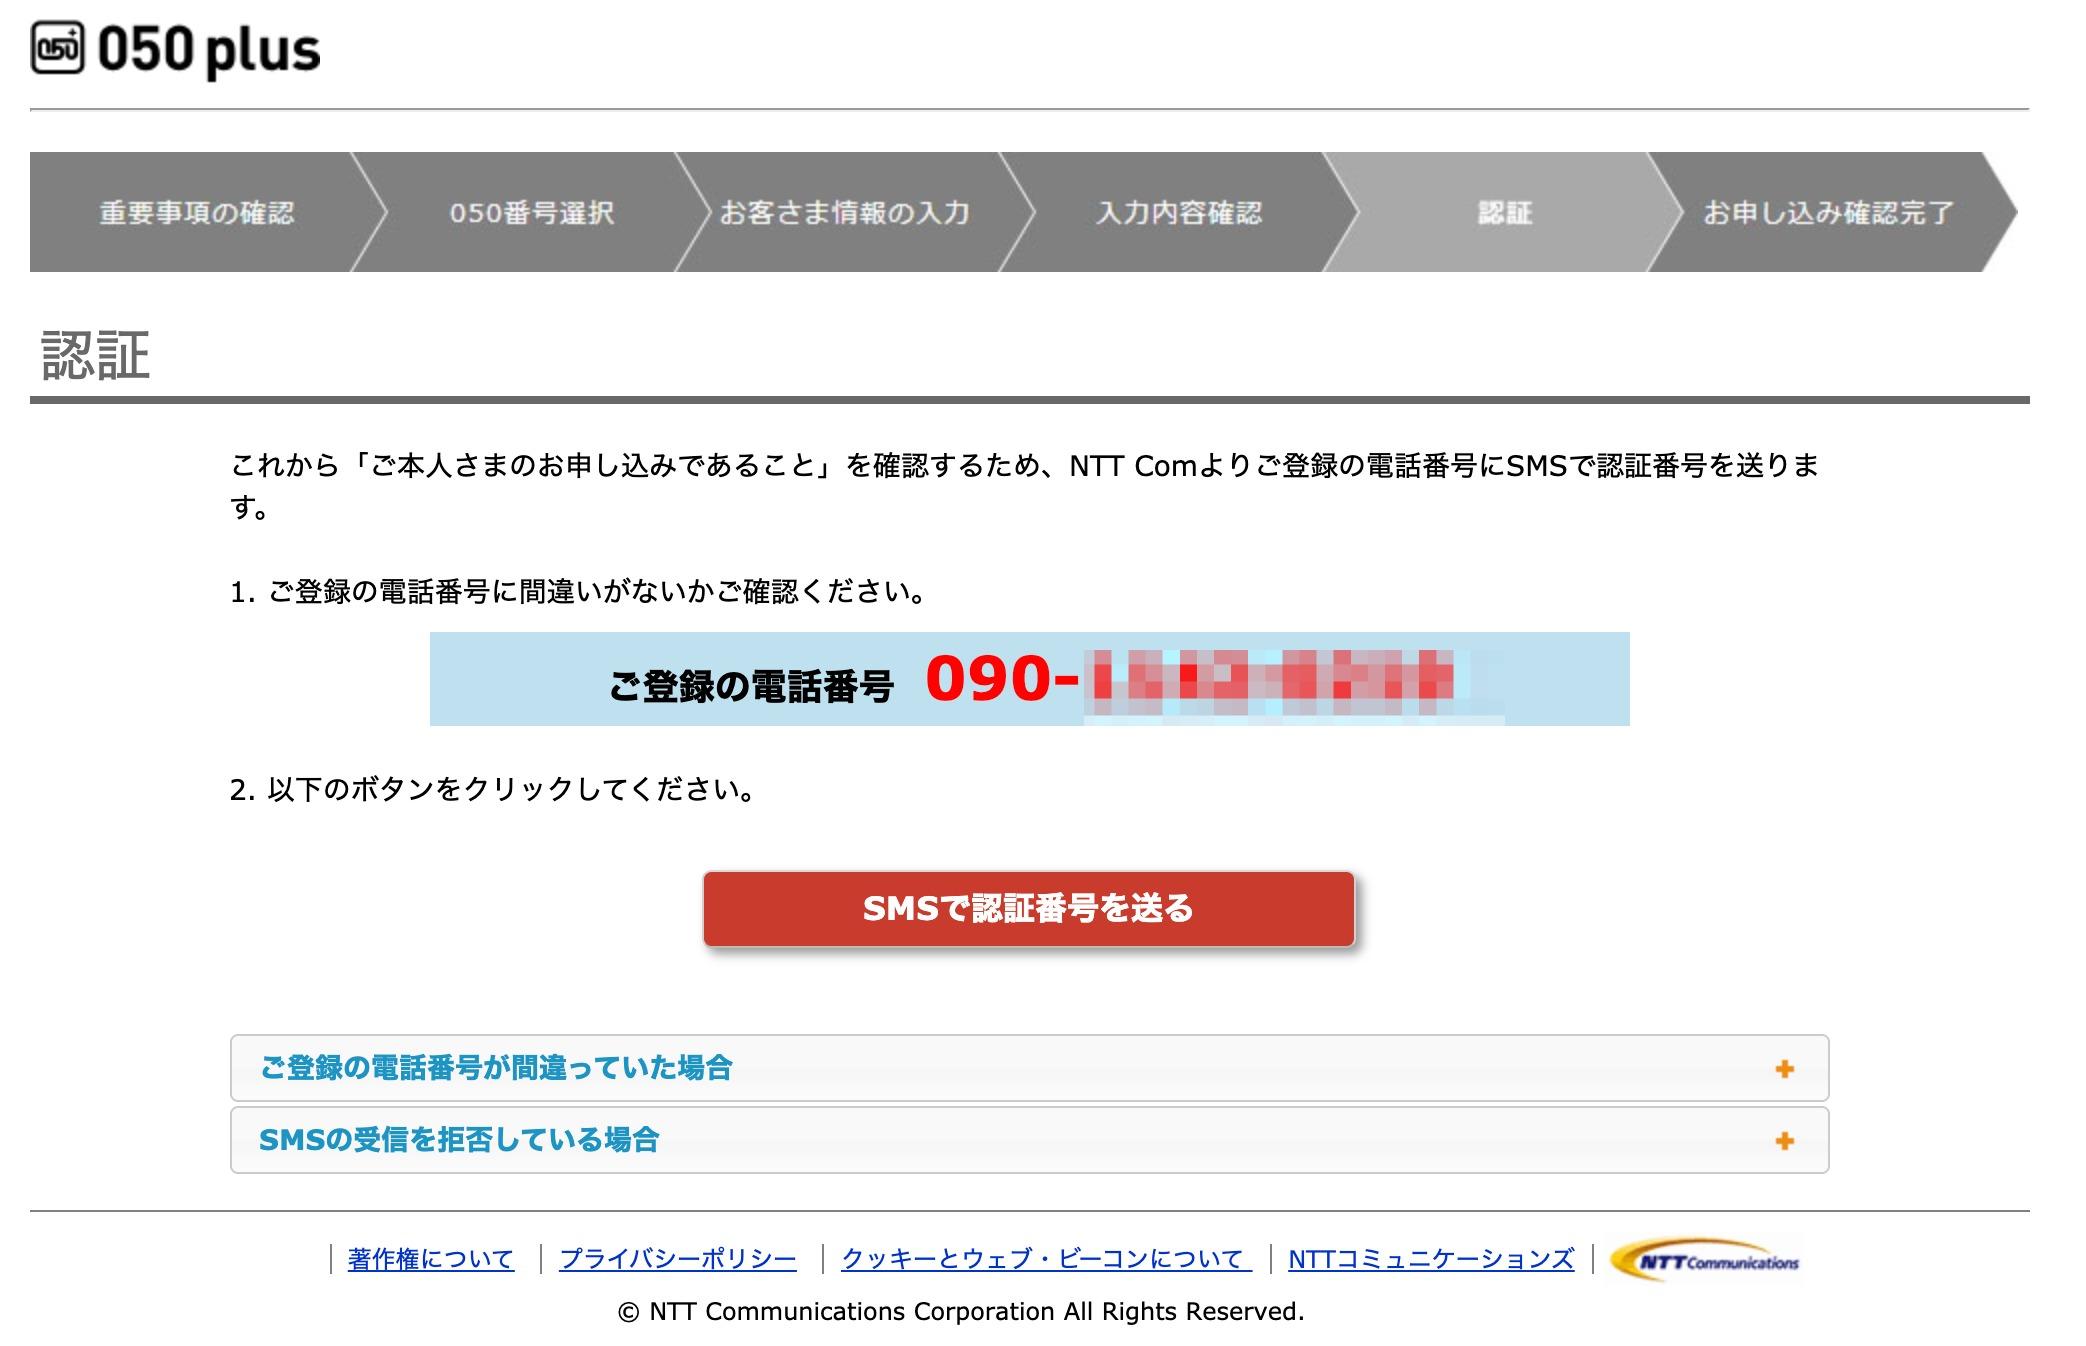 050plus認証番号